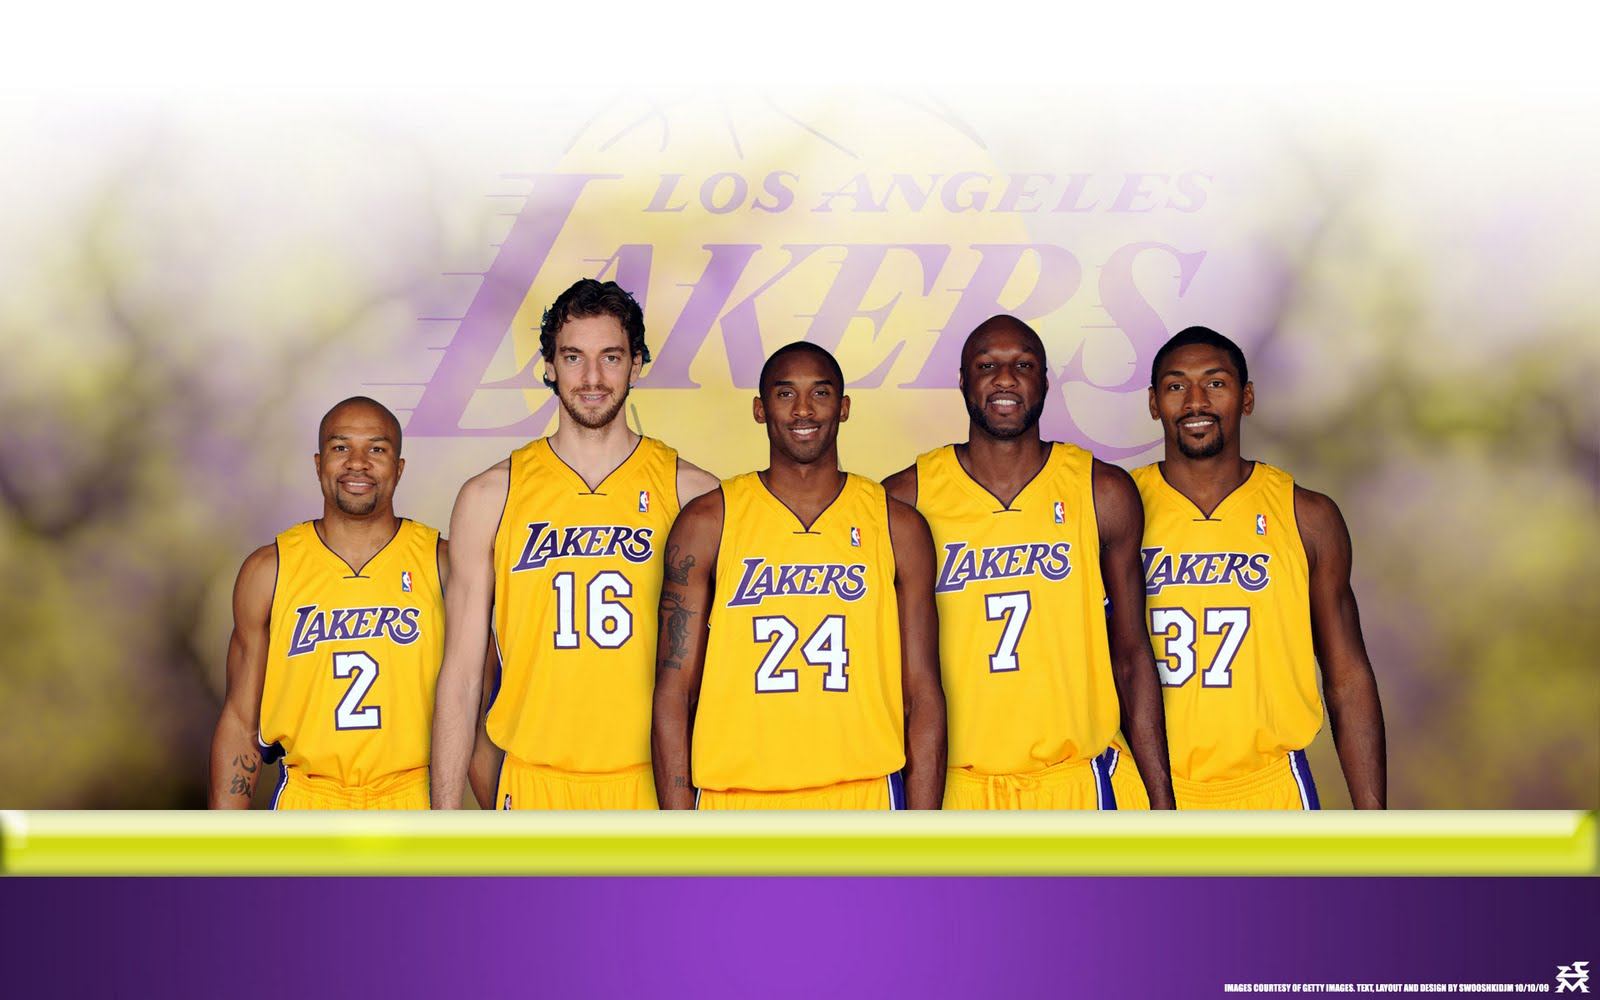 http://2.bp.blogspot.com/_FUqunw1CcGY/TQ5MWLvxhtI/AAAAAAAAAds/jENvEgpaSRM/s1600/LA-Lakers-2010-Starting-Five-Widescreen-Wallpaper.jpg